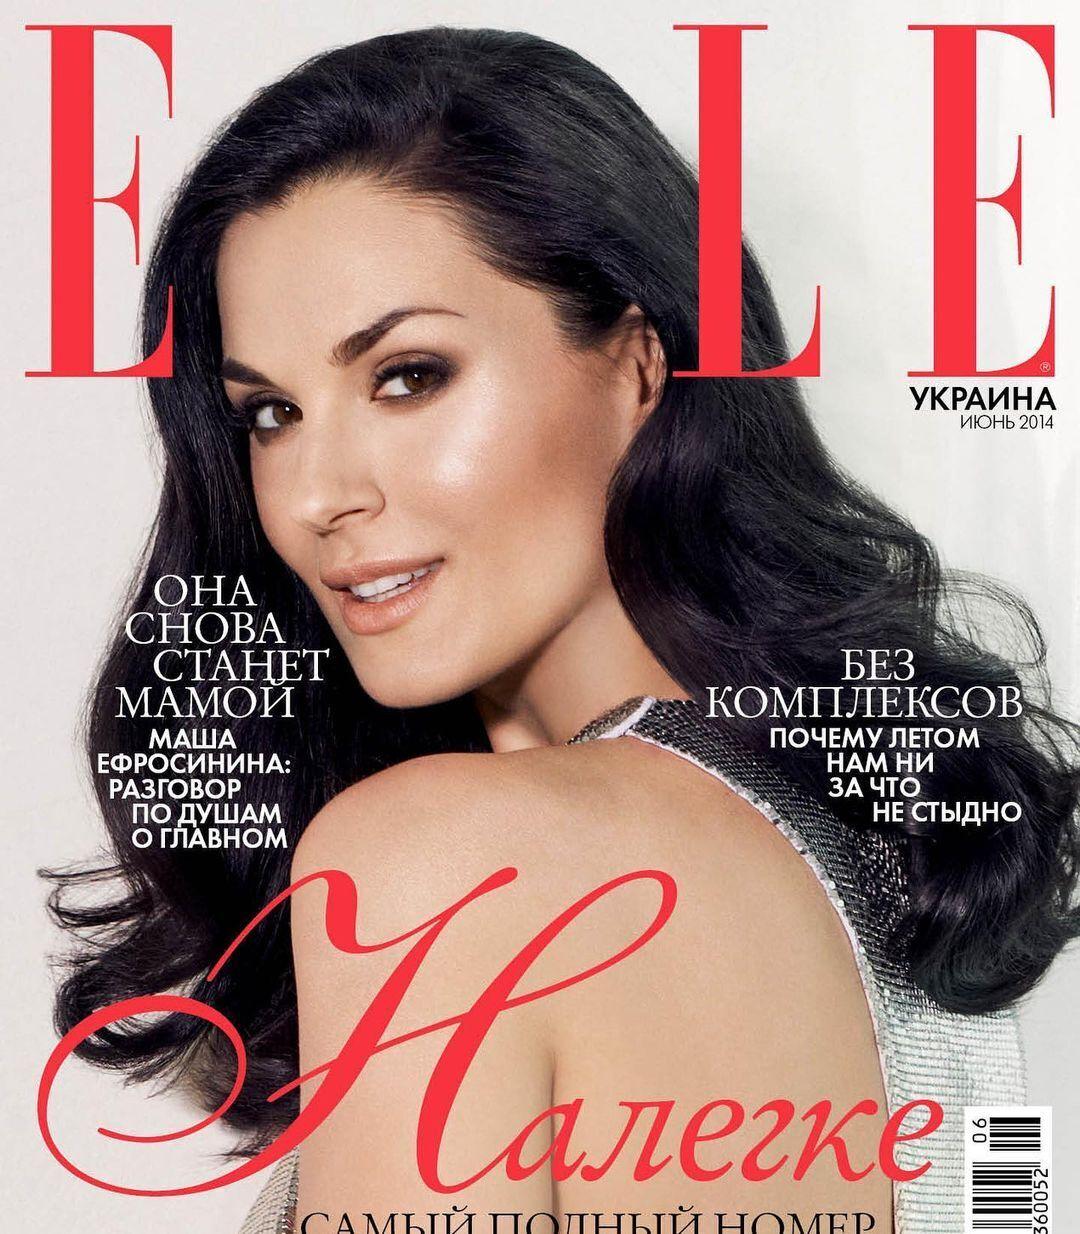 Маша Ефросинина на обложке журнала в 2014 году